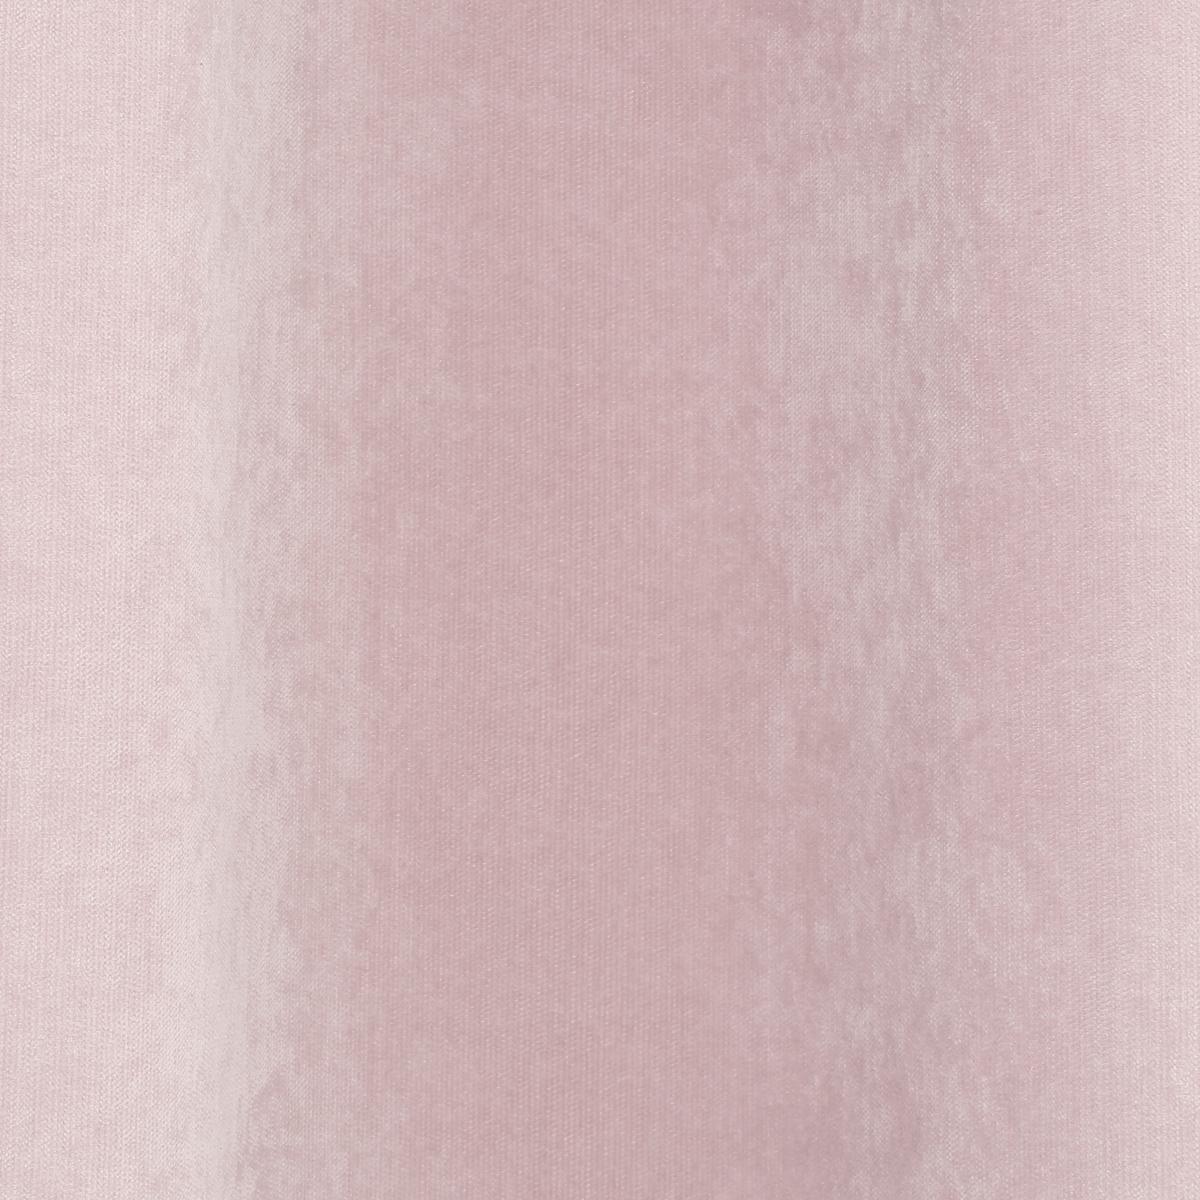 Rideau velours rose Hijua 140x260 cm